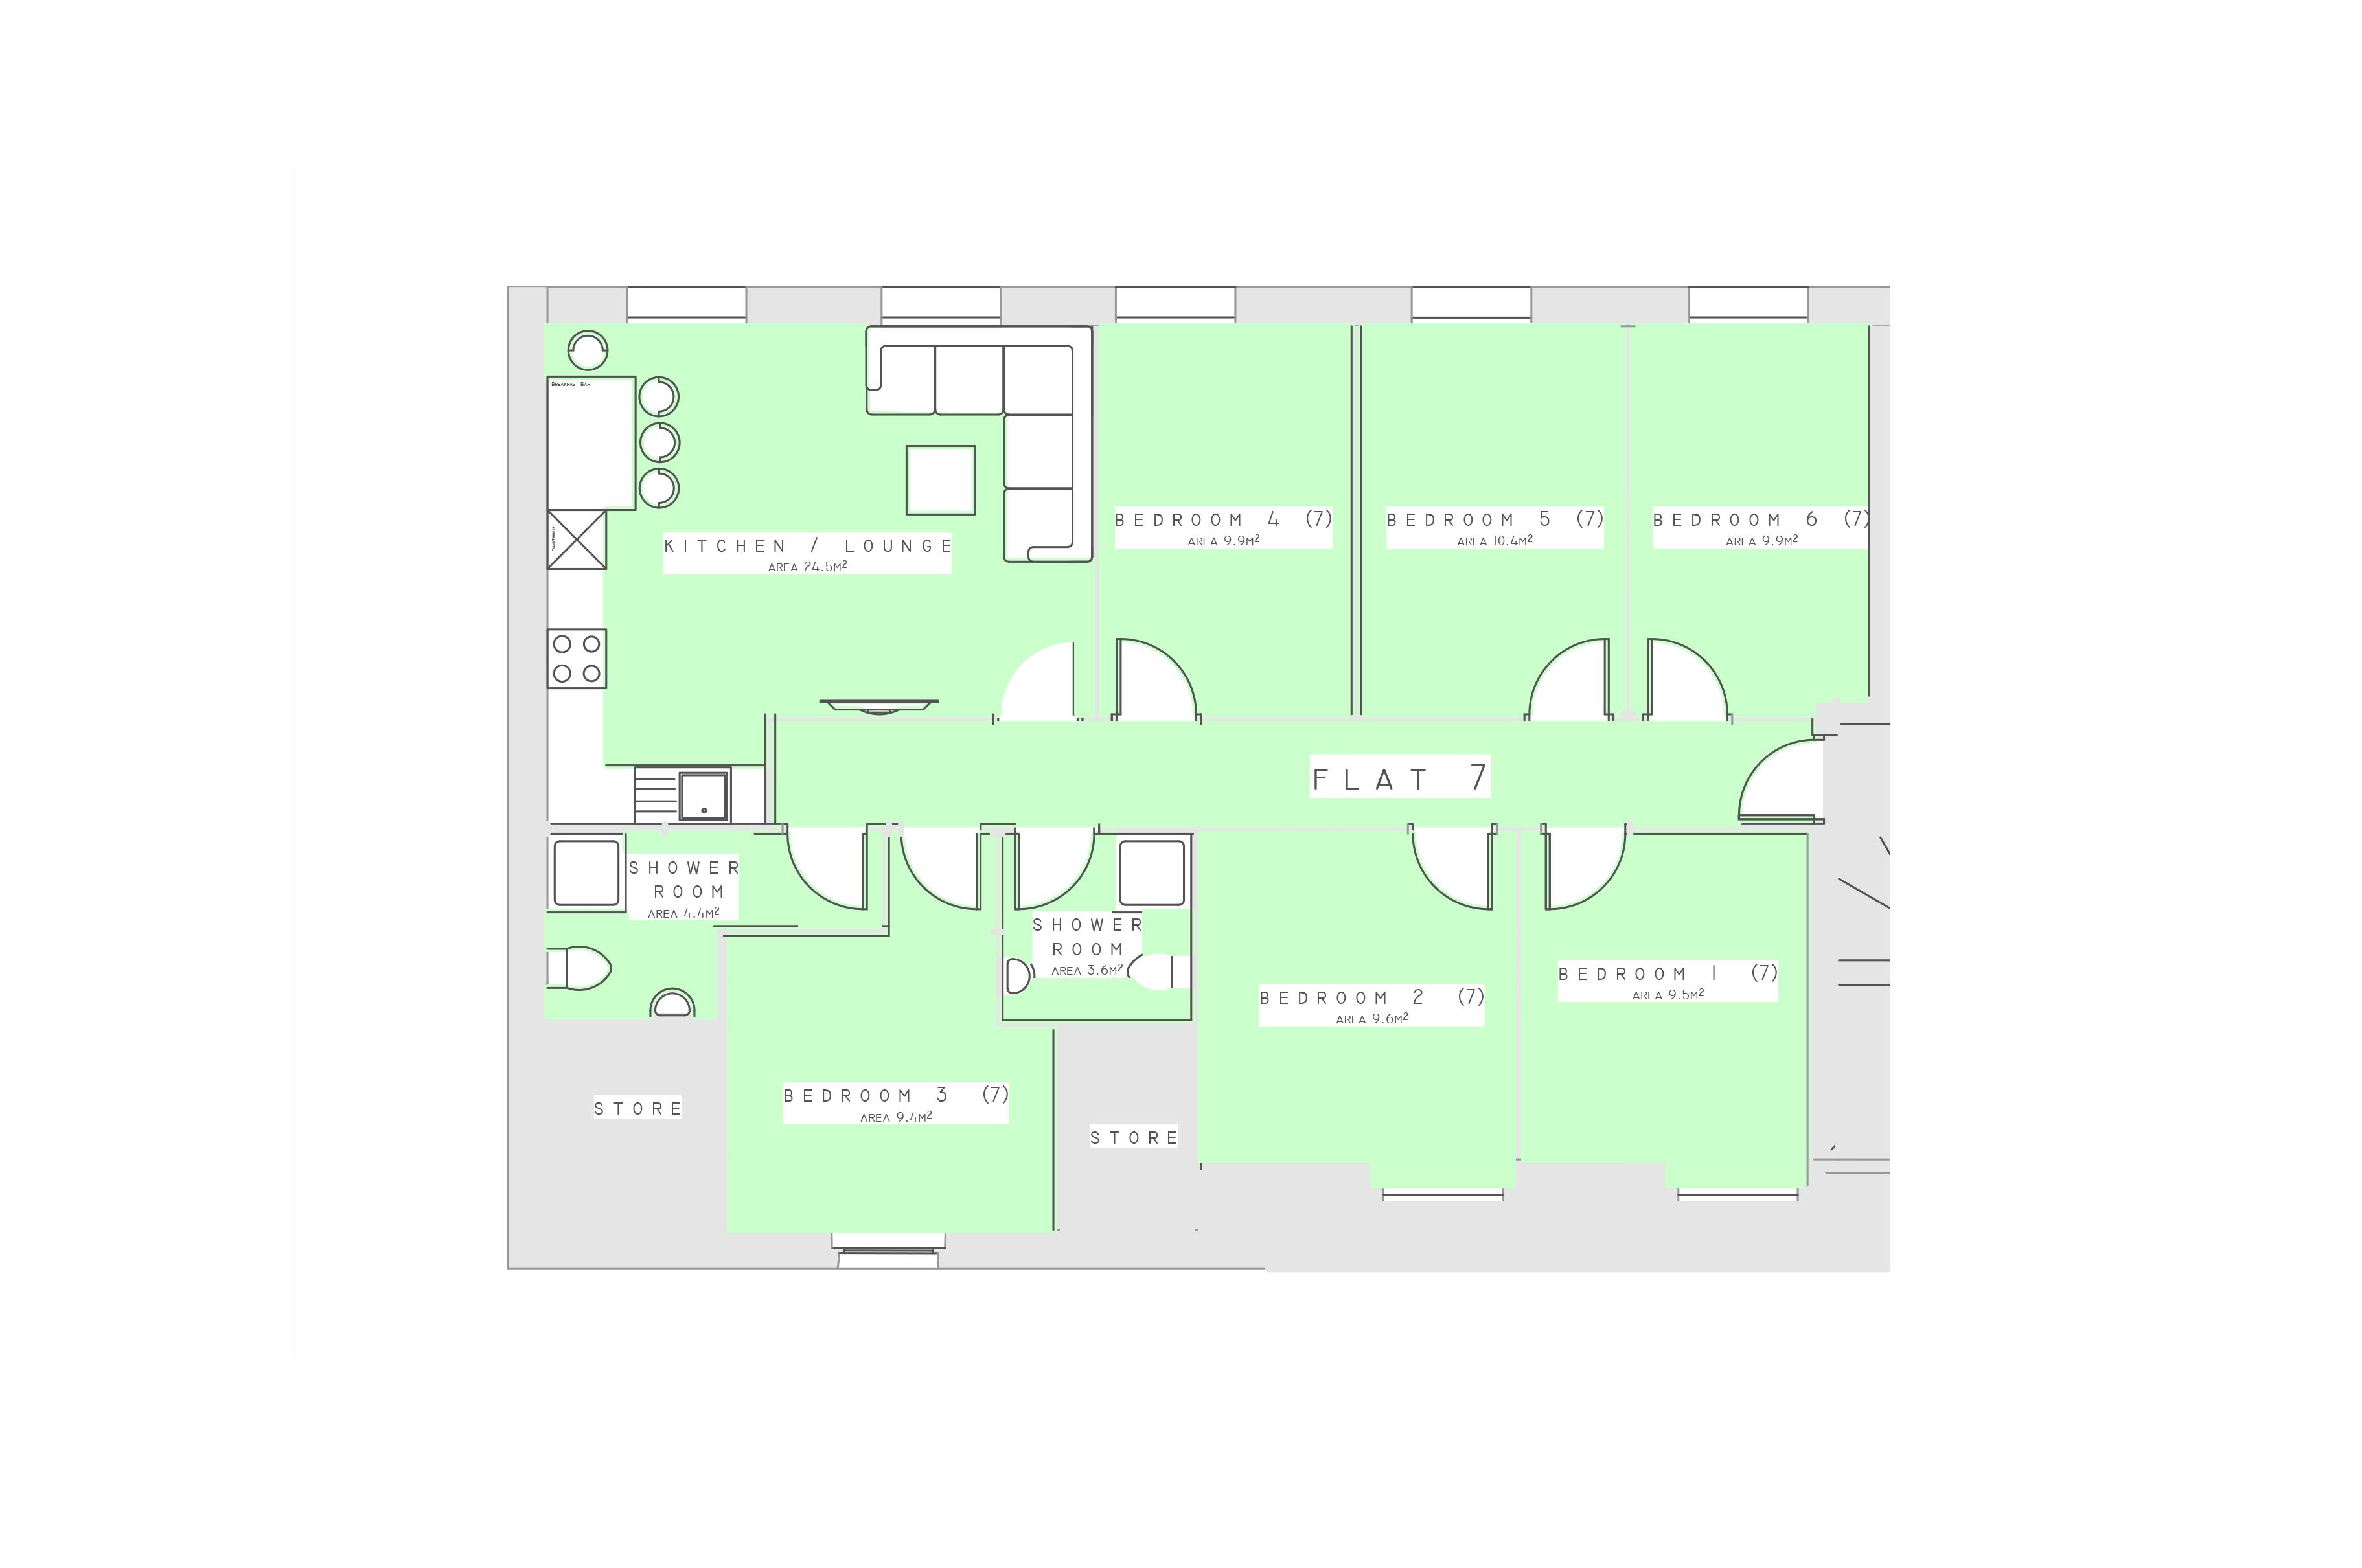 Flat 7 Floorplan